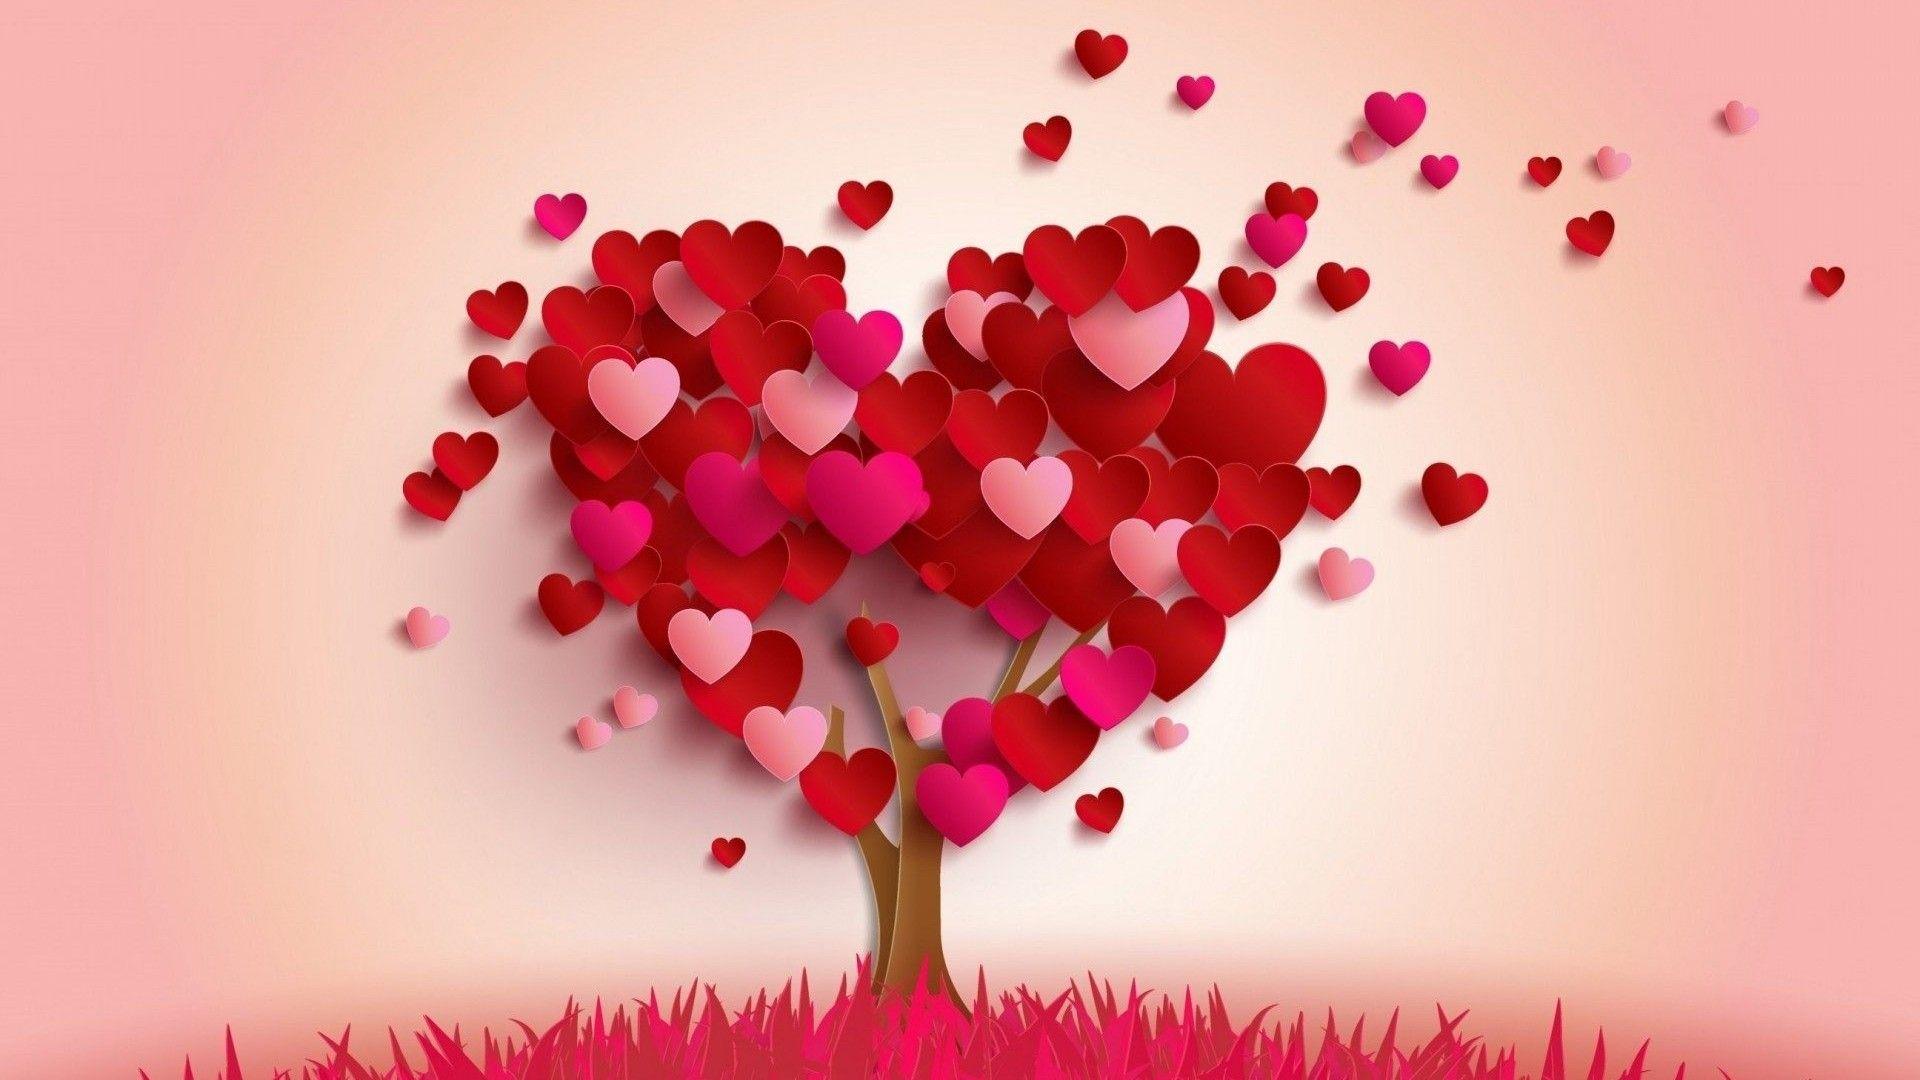 Cool Wallpaper Love Cute - ec0f3250e5ebd8b7495655a301283431  Pic_1183.jpg